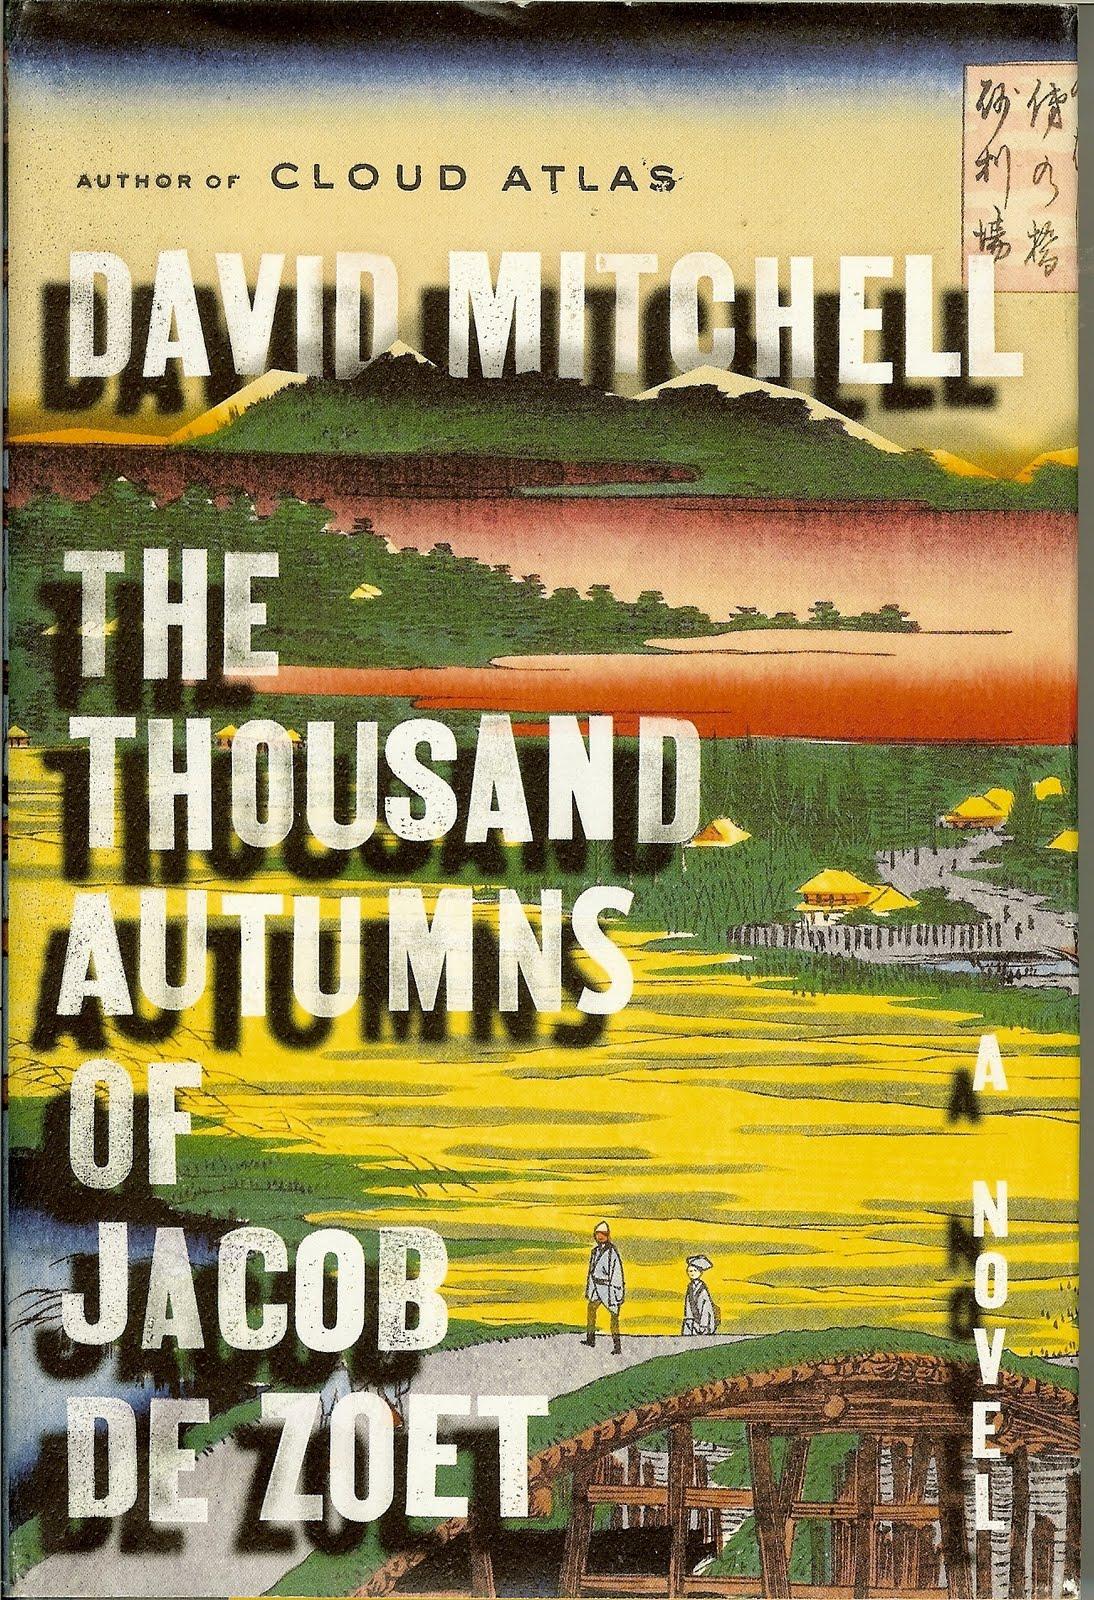 bookcooker: TheThousand Autumns of Jacob de Zoet and Green ...